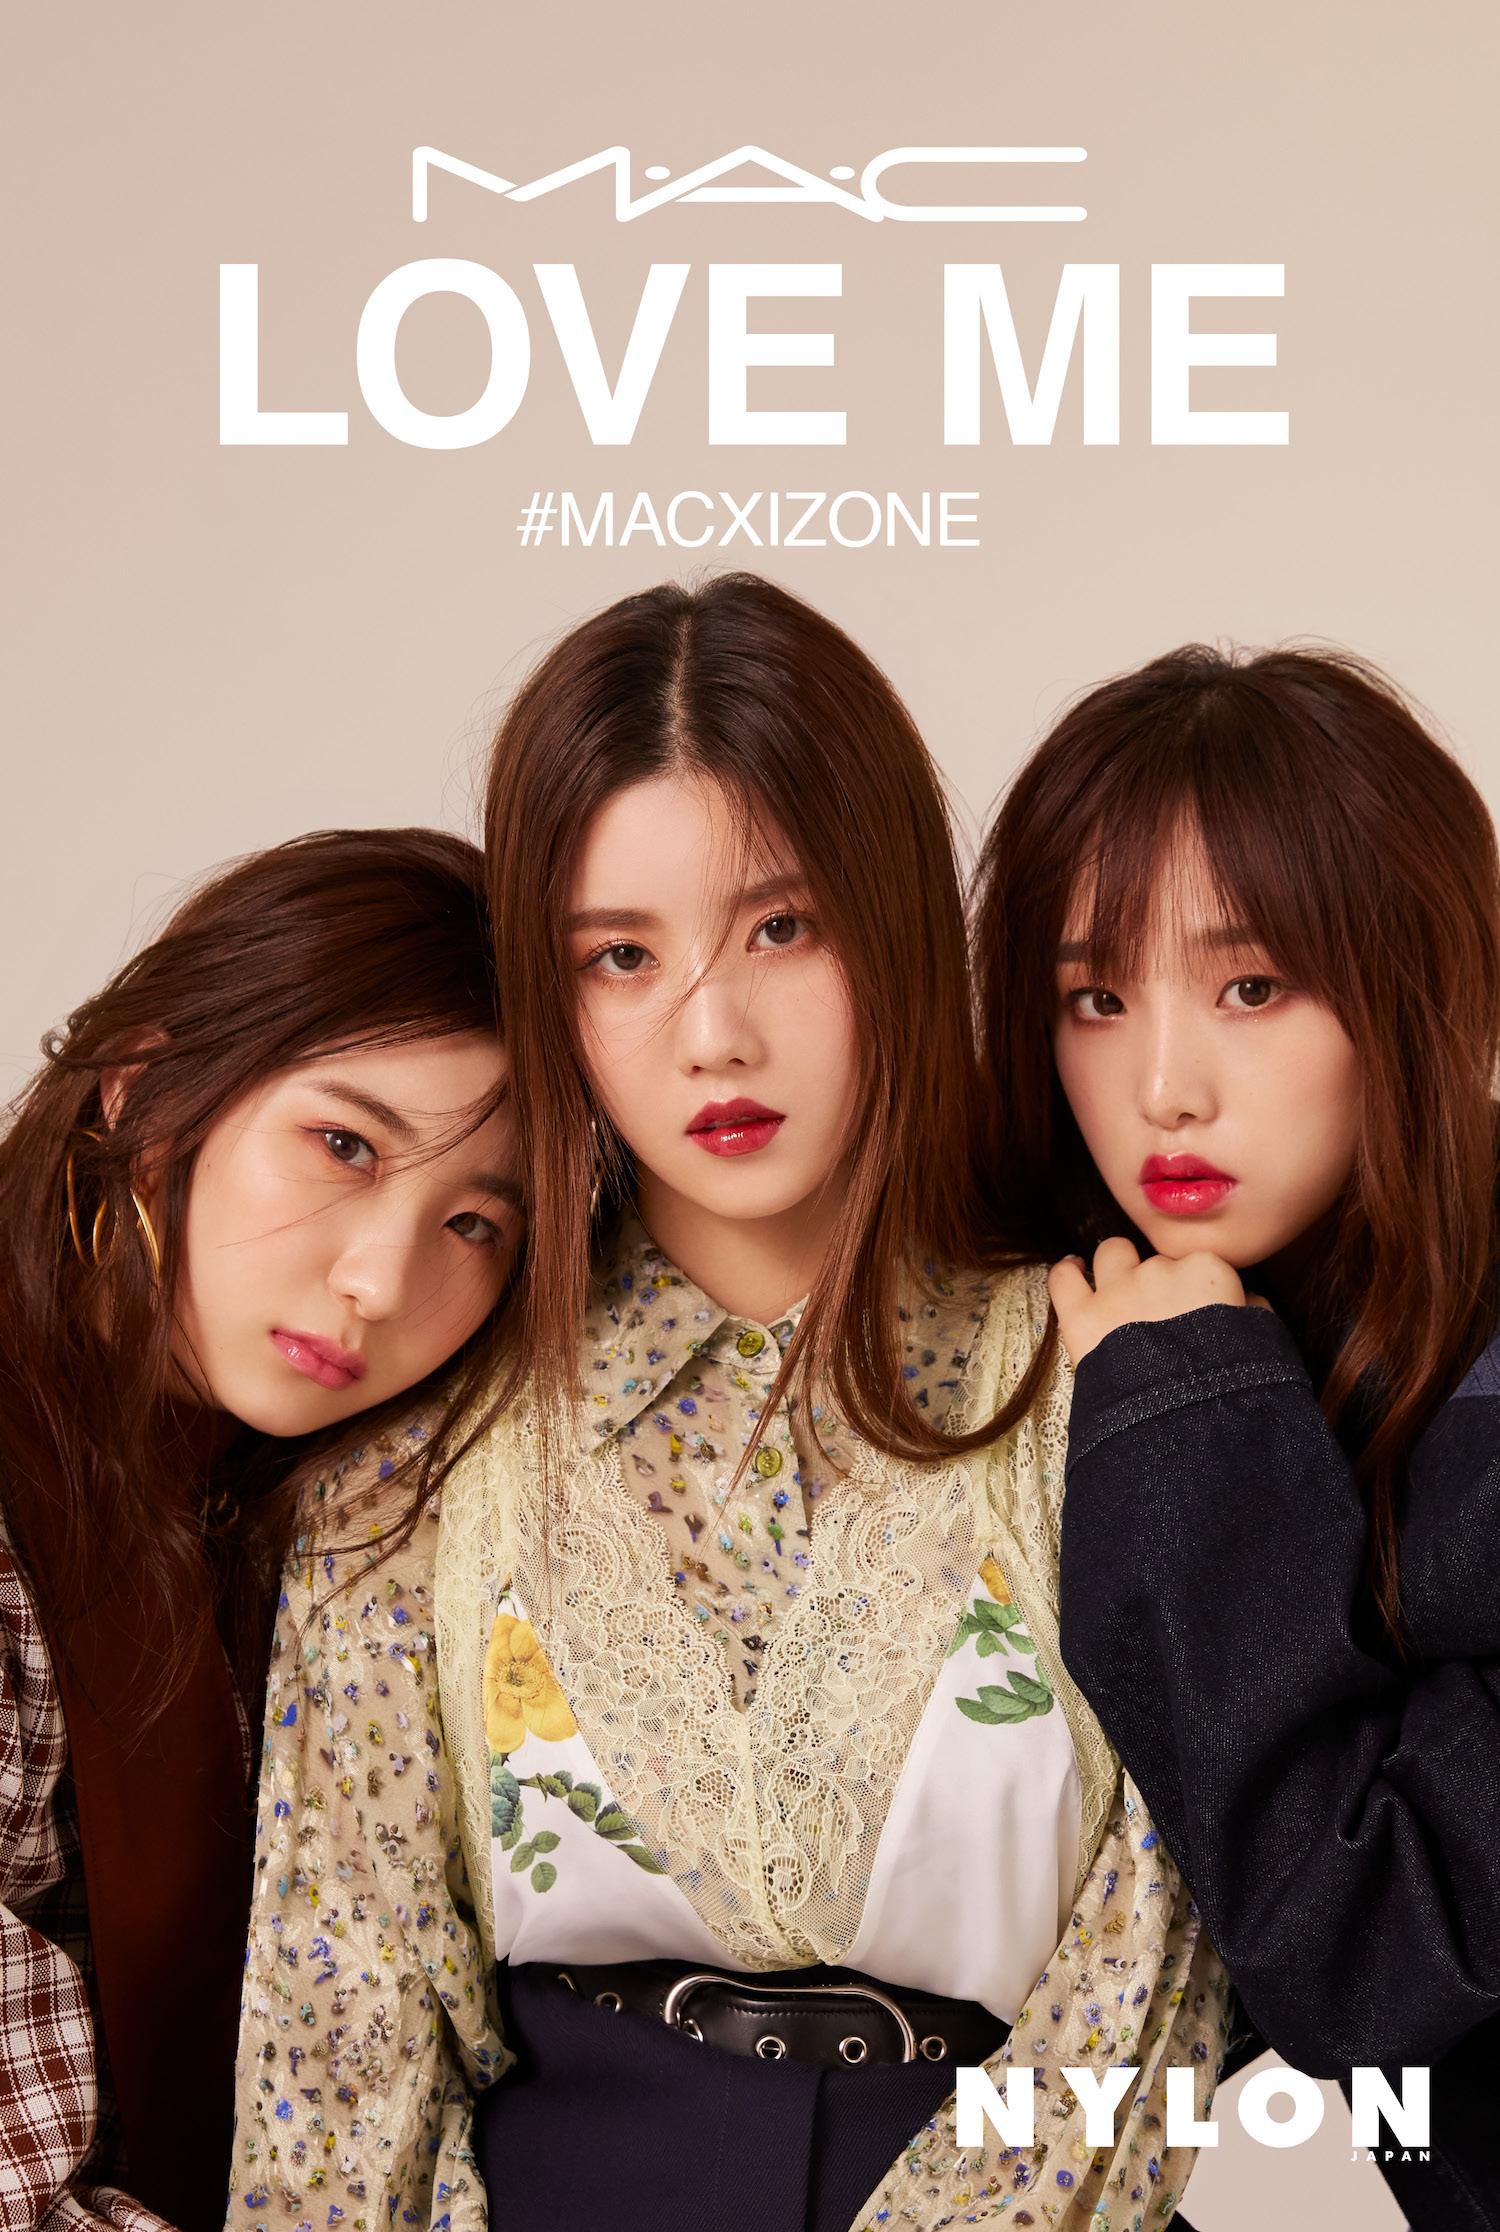 IZ*ONEが纏うM·A·Cの新作リップスティック[LOVE ME LIPSTICK]NYLON JAPANと連動した限定ビジュアル